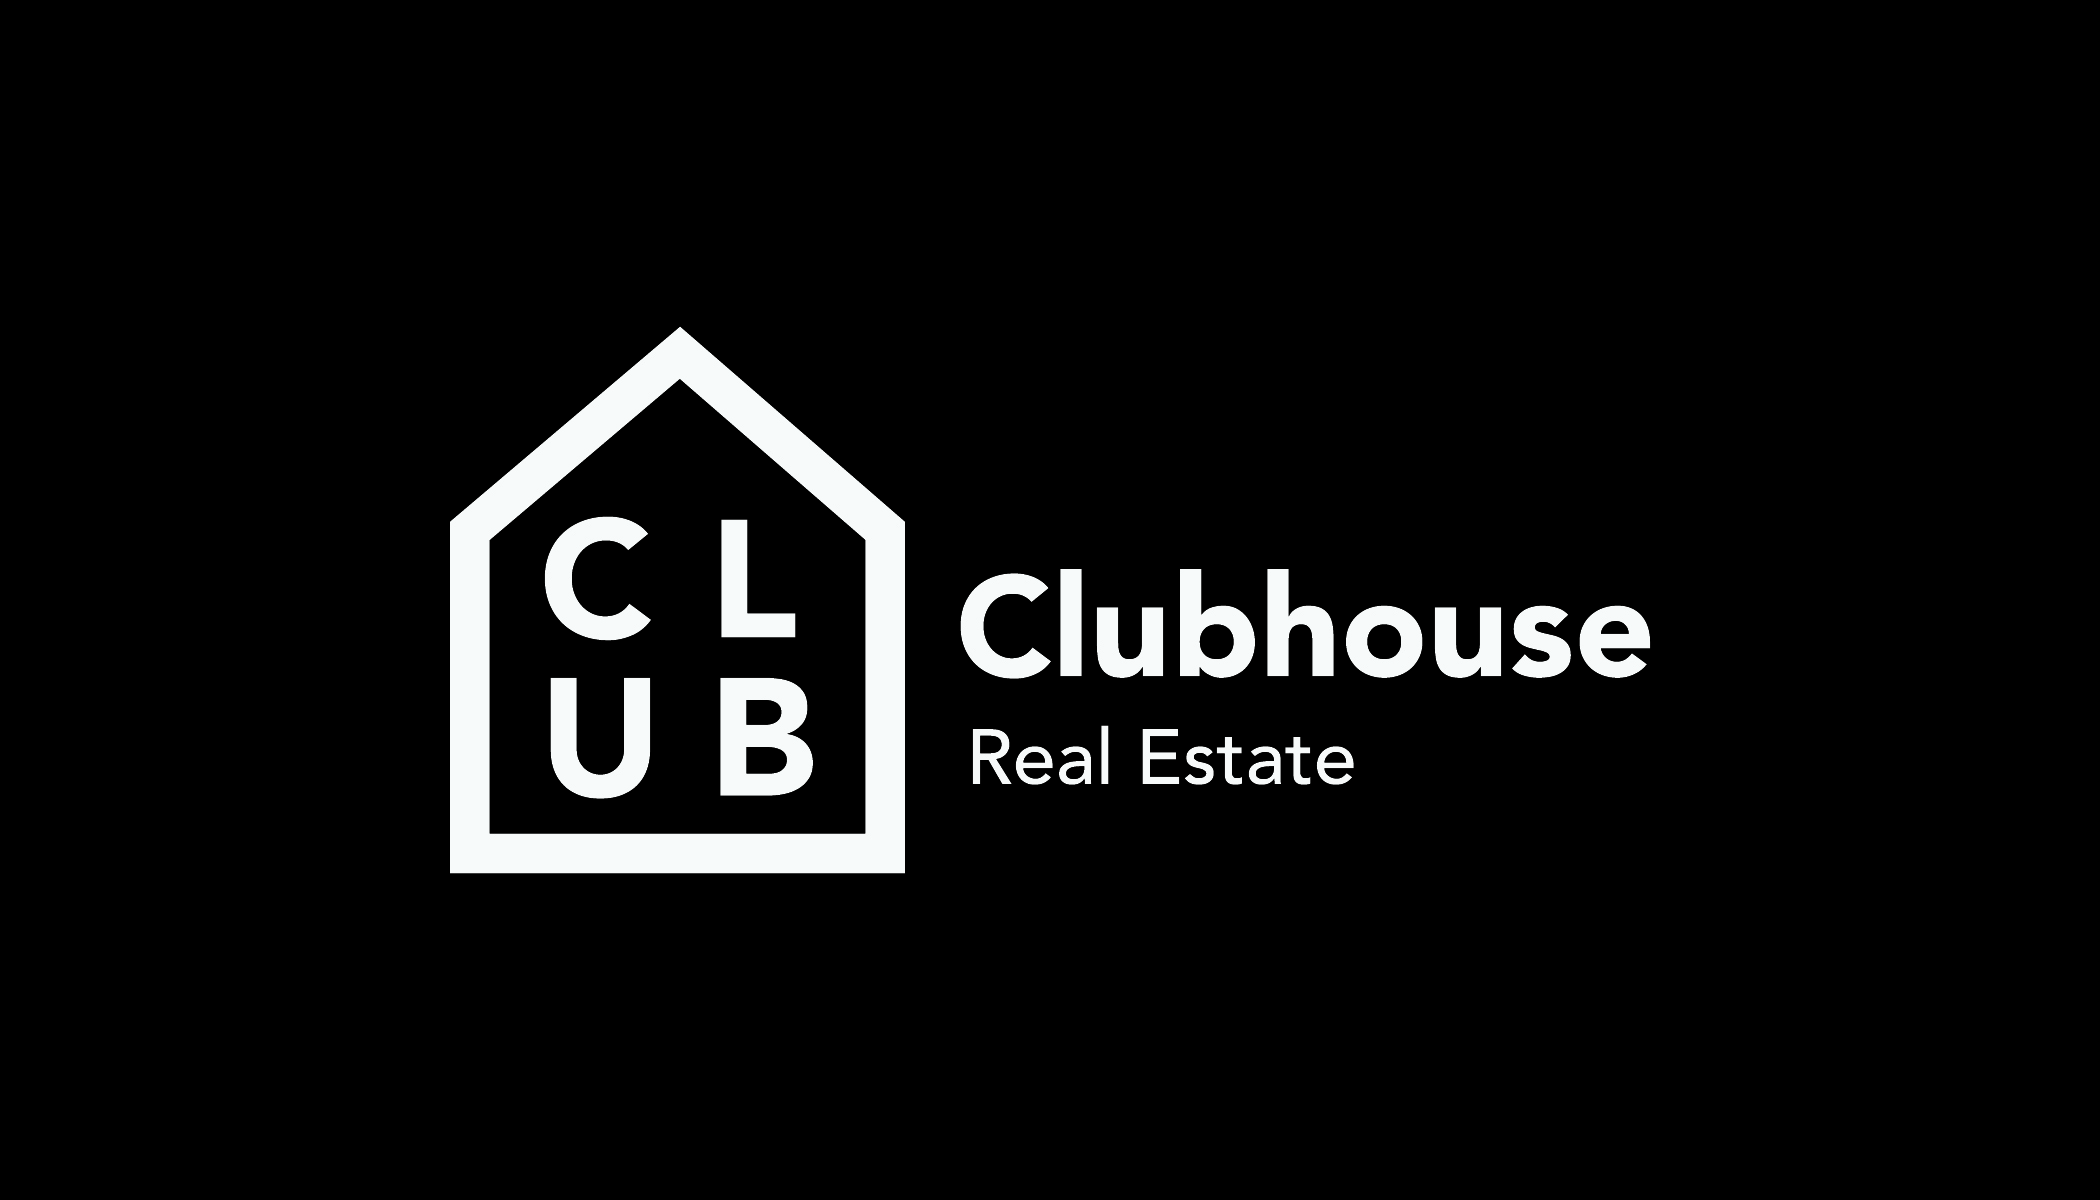 CLUB_HOUSE_LOGO-06.jpg